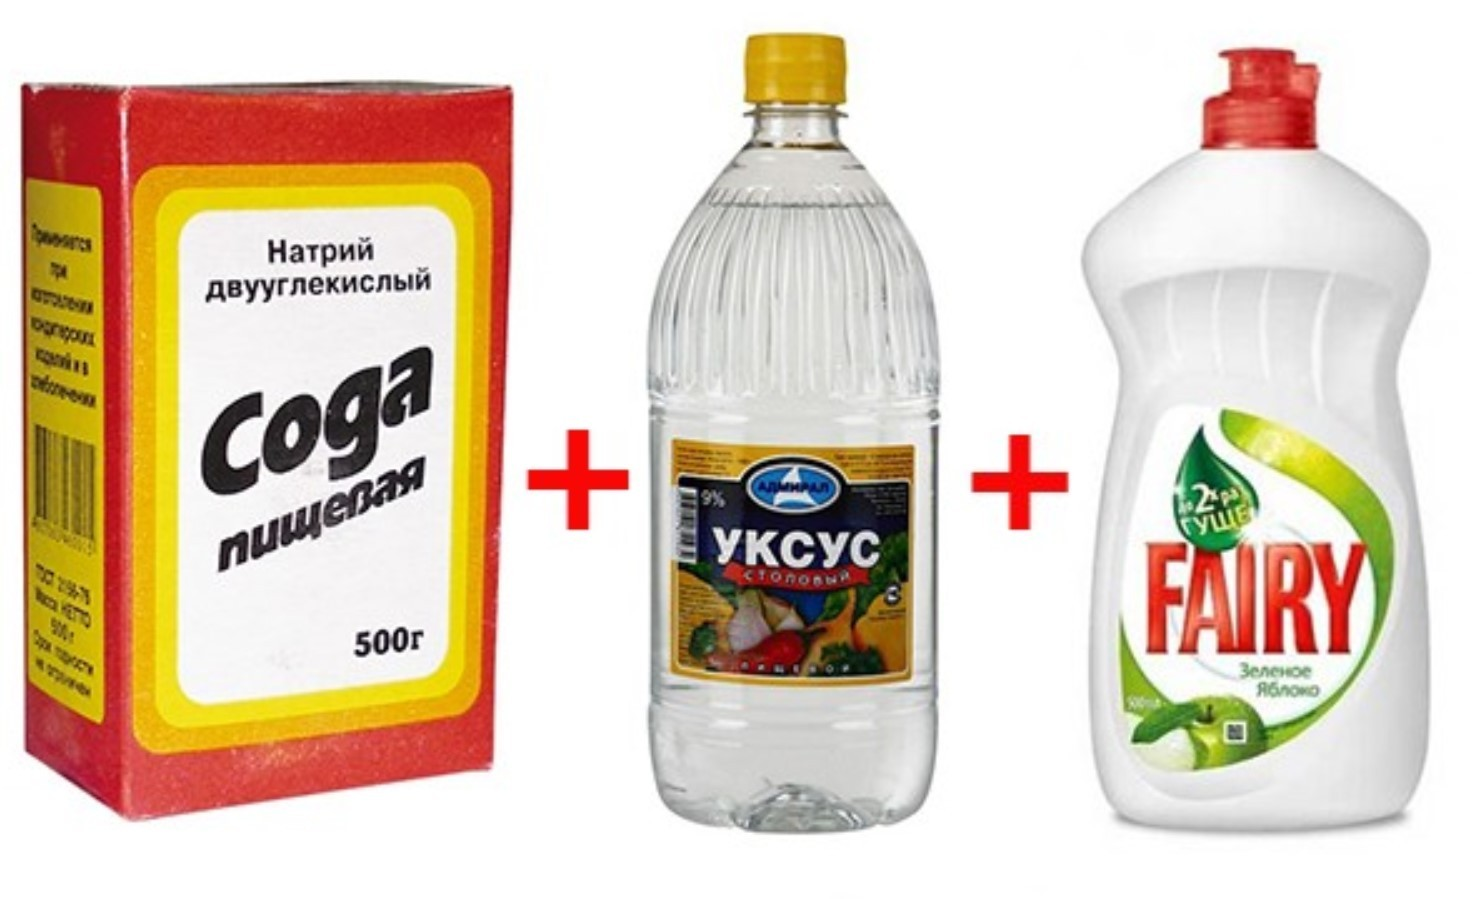 Сода, уксус, моющее средство